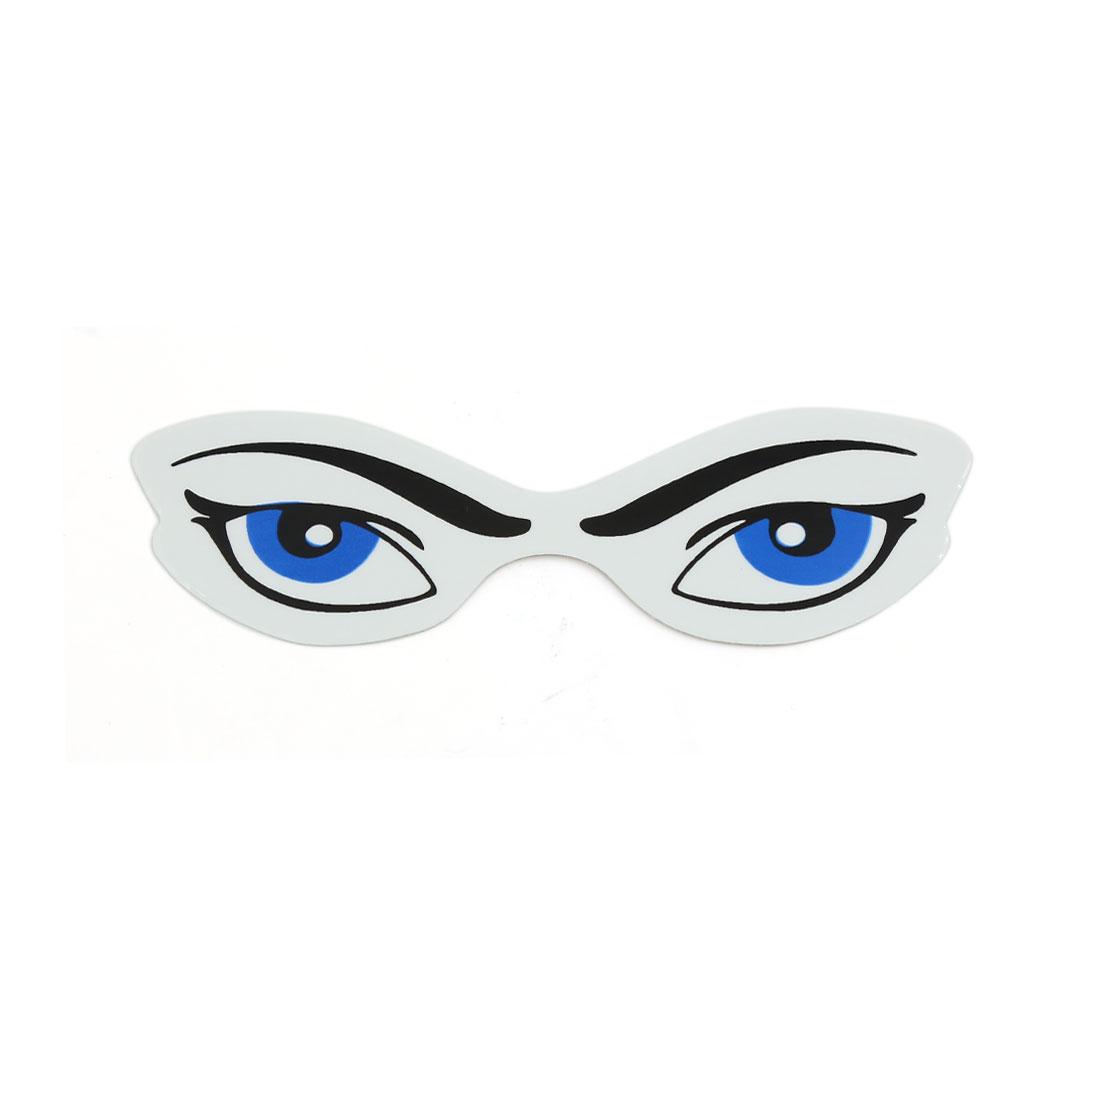 10 Pcs Blue Black Eyes Style Self Adhesive Car Exterior Sticker DIY Decoration